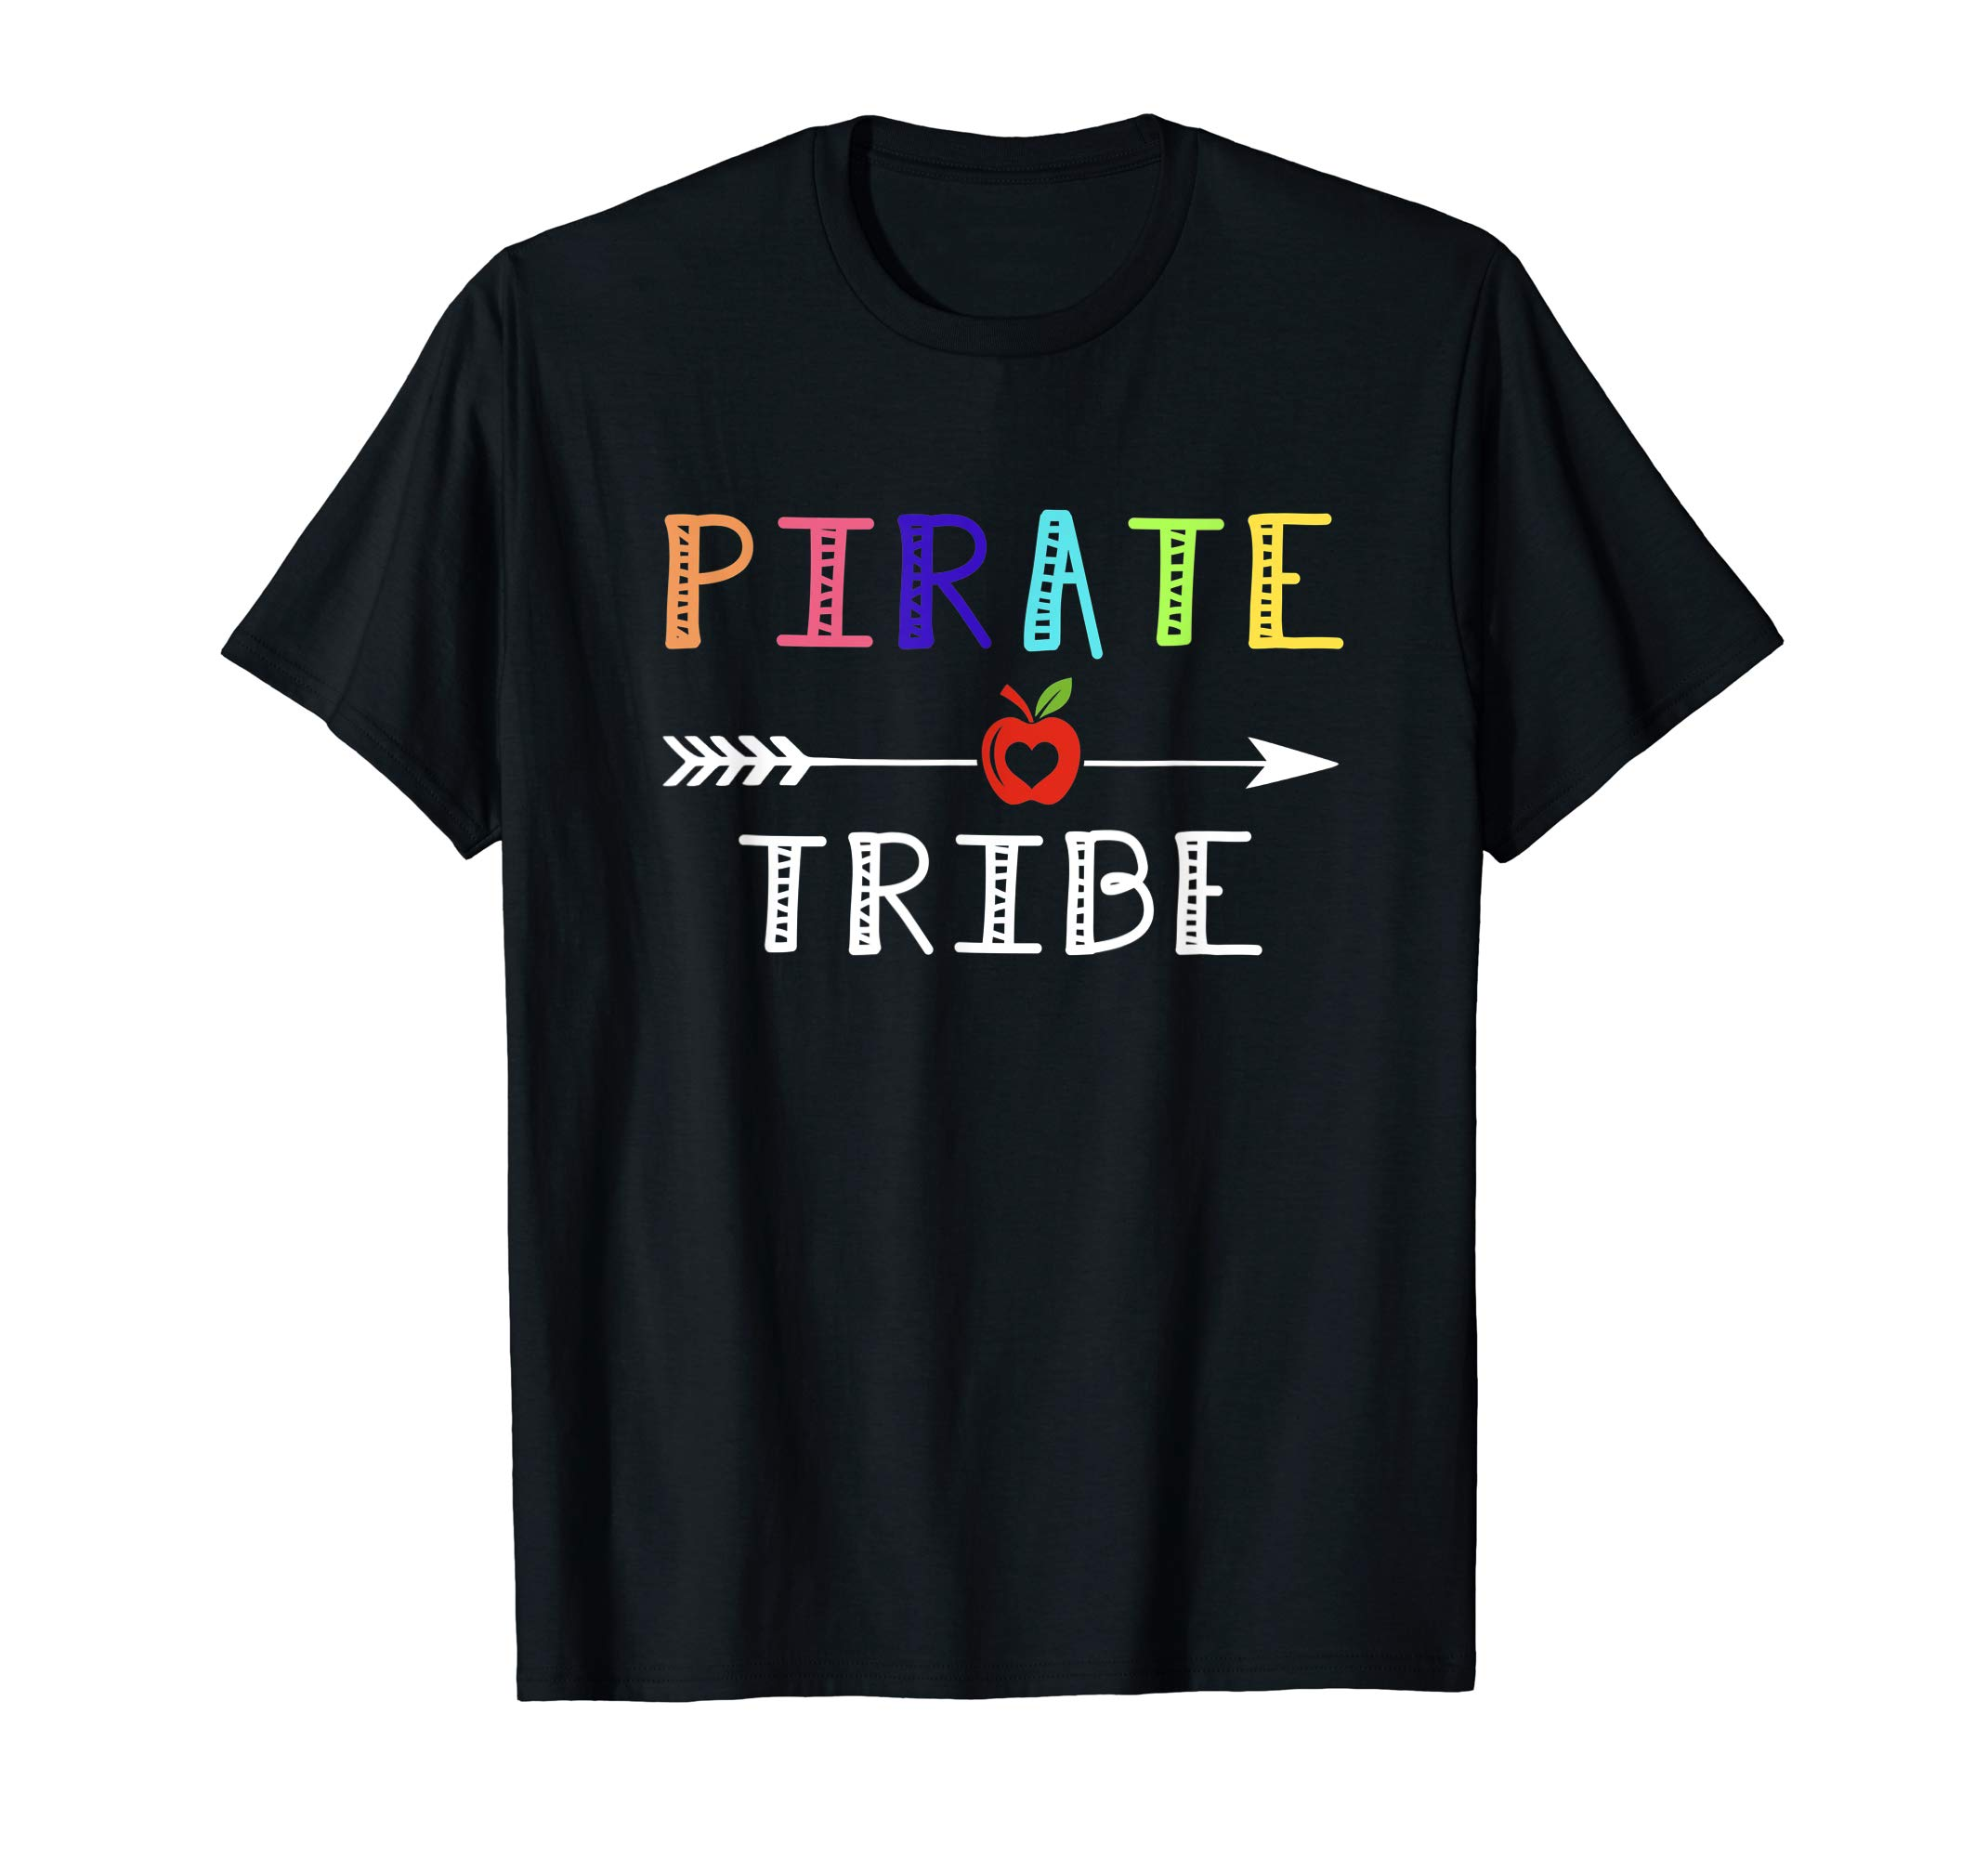 b66170e0 Team Pirate Teacher Tribe Back To School Tee Shirt - Reviewshirts Office